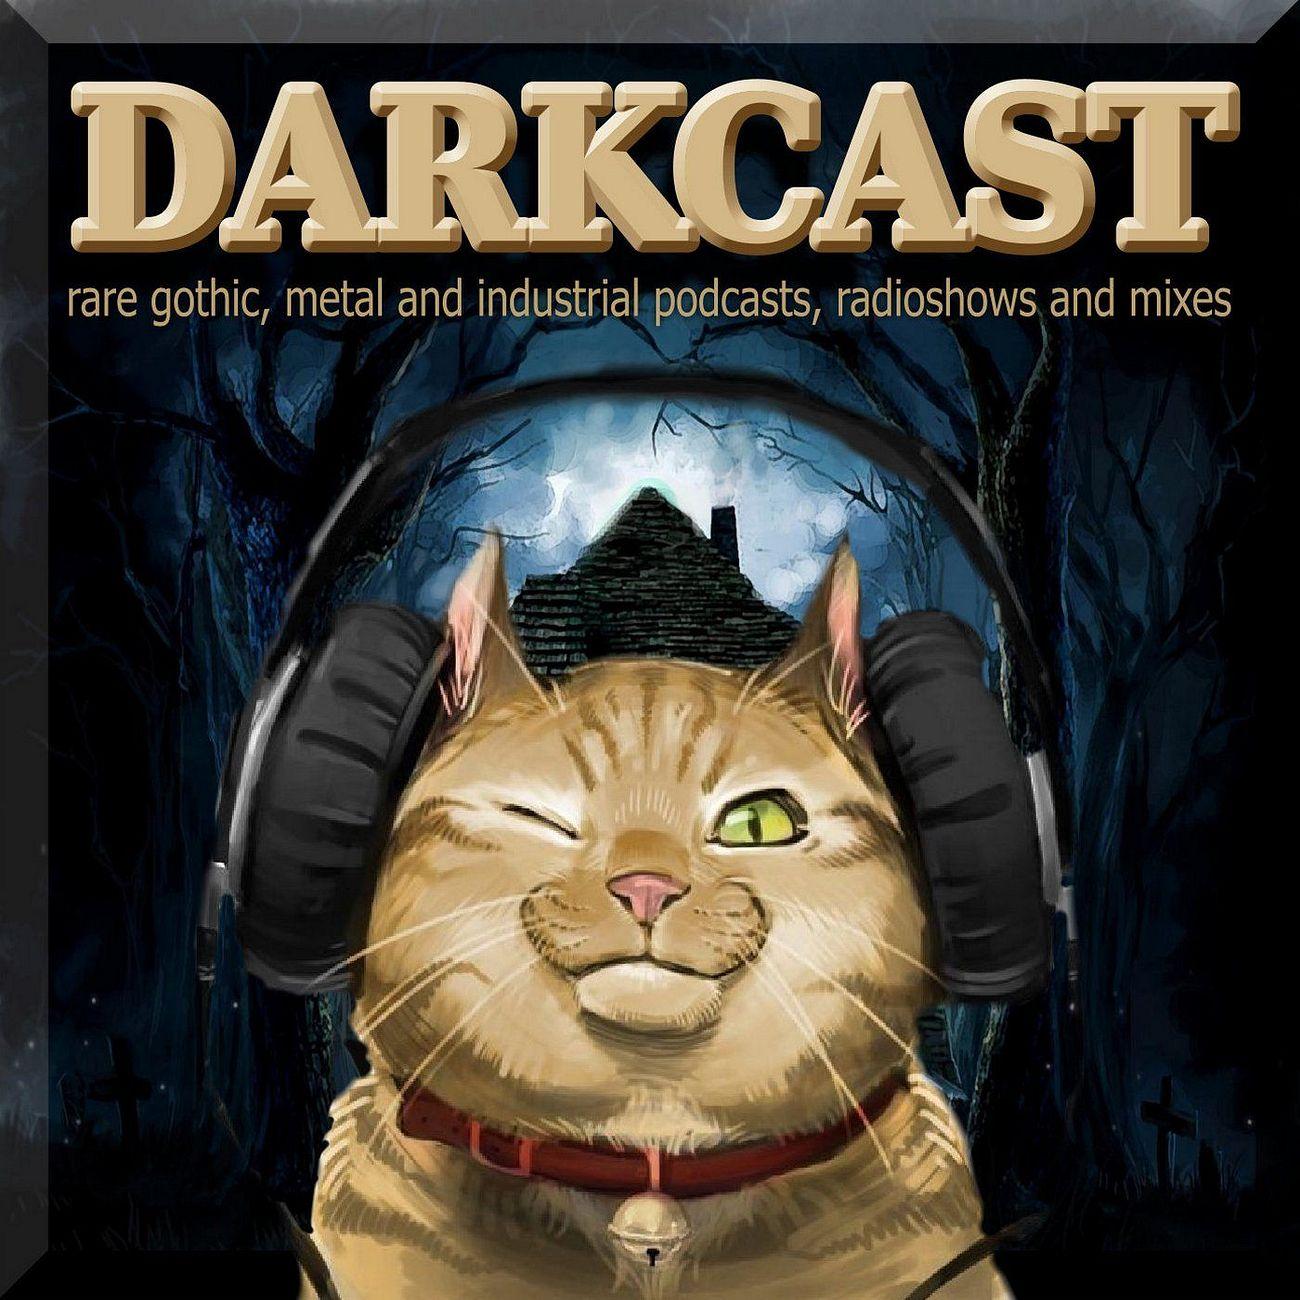 Darkcast